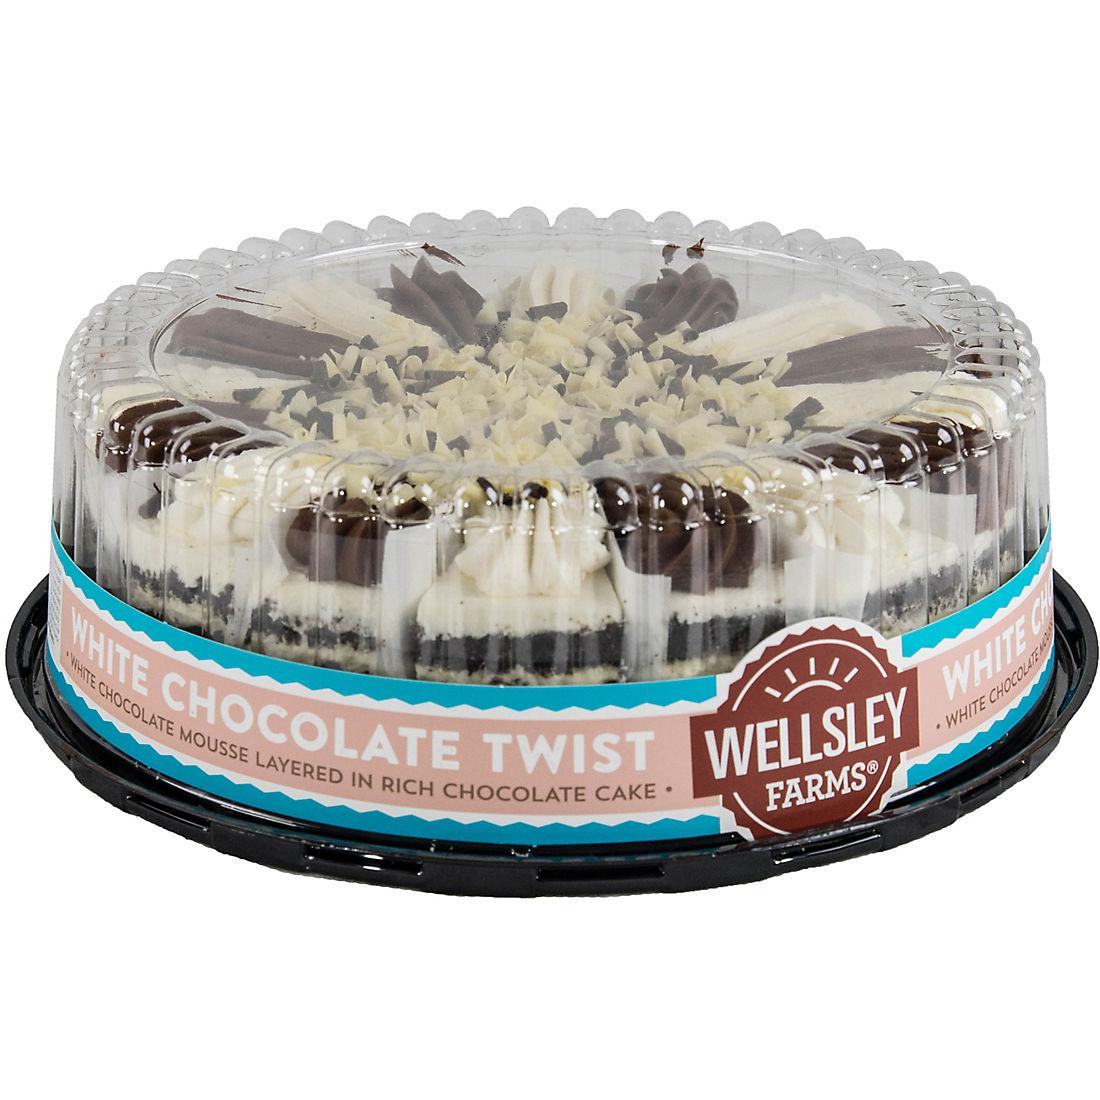 Pleasant Wellsley Farms 10 White Chocolate Twist Cake Bjs Wholesale Club Funny Birthday Cards Online Overcheapnameinfo